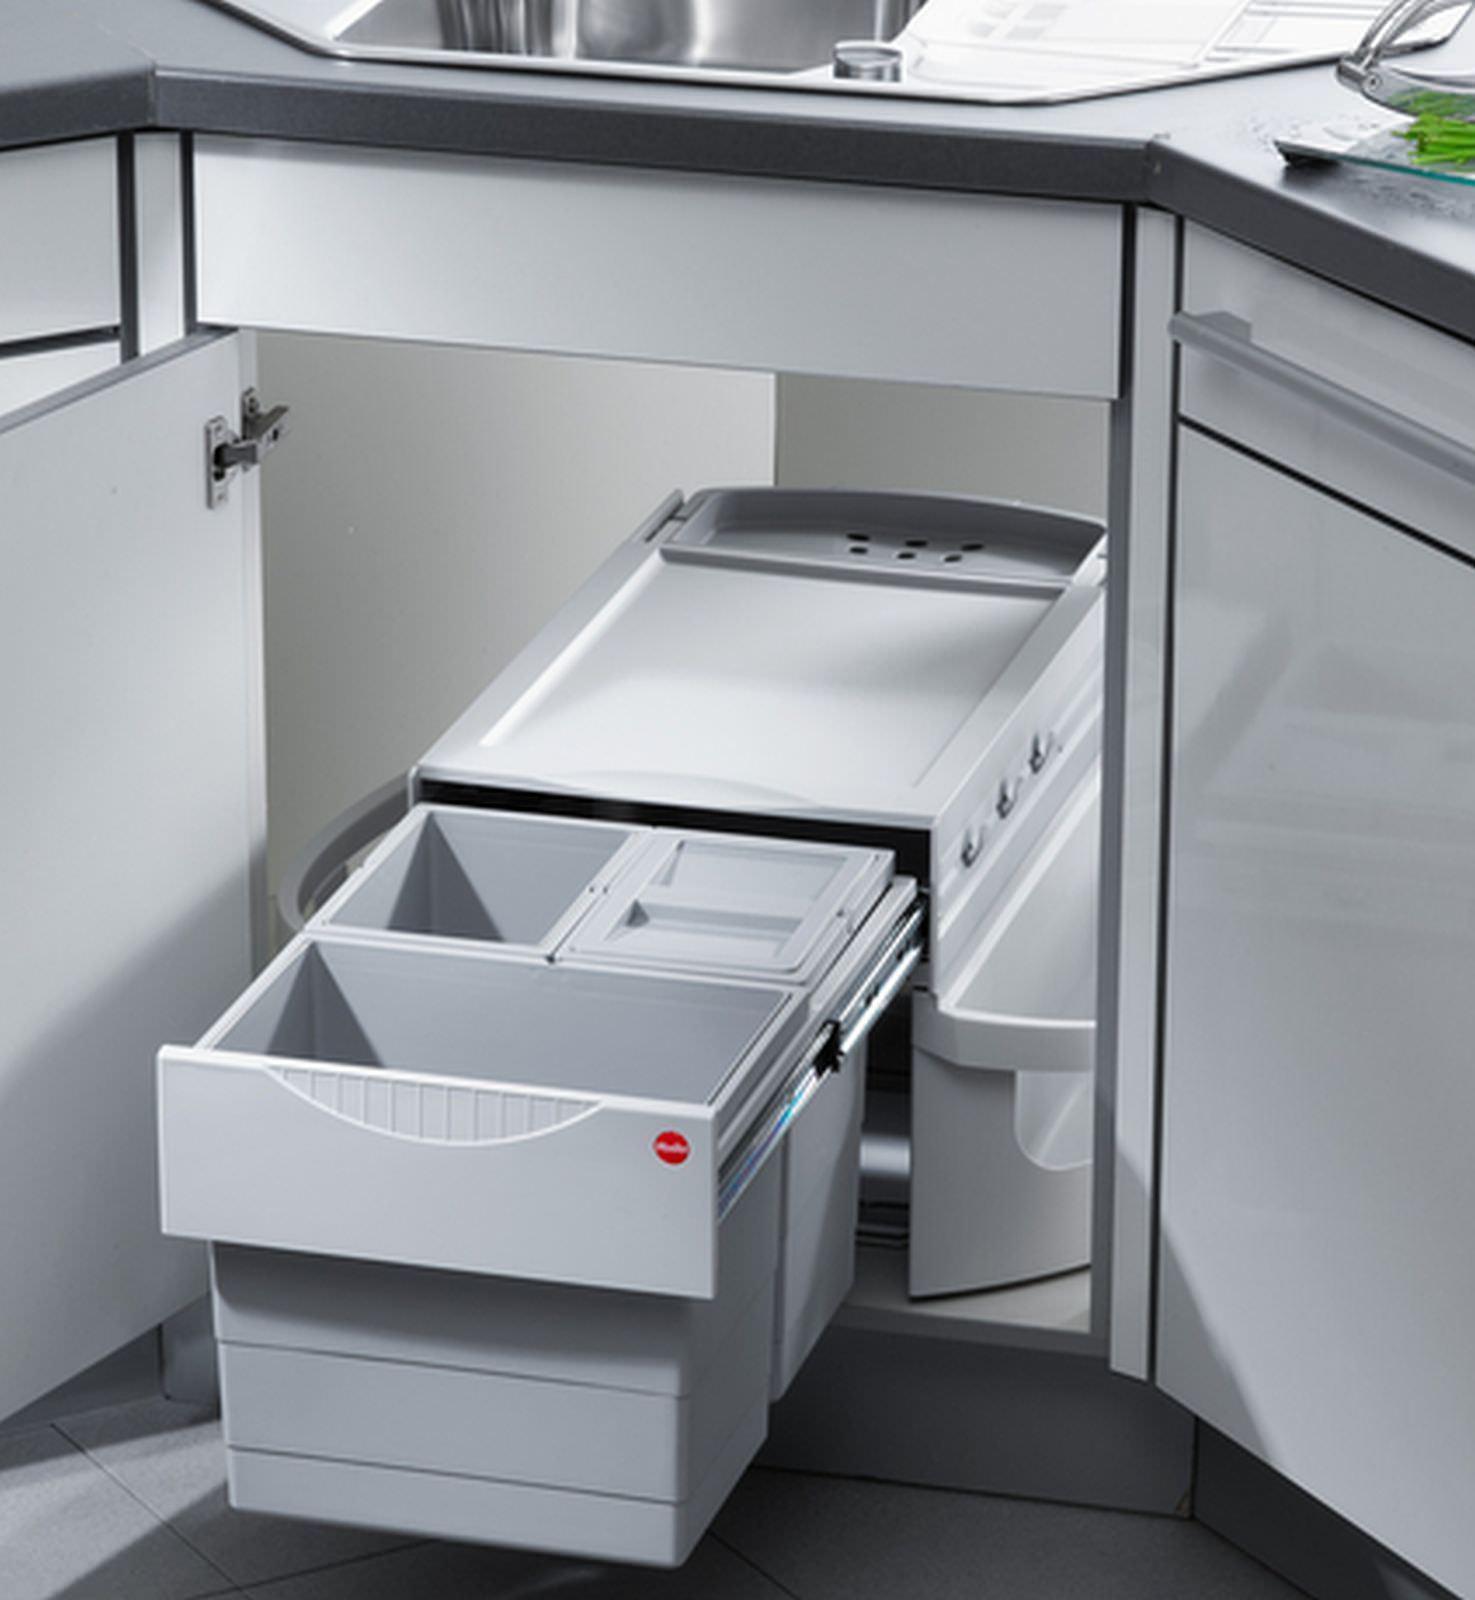 Mülleimer Küche Unterschrank   3 Fach Mülleimer Küche 26 Mülleimer ...